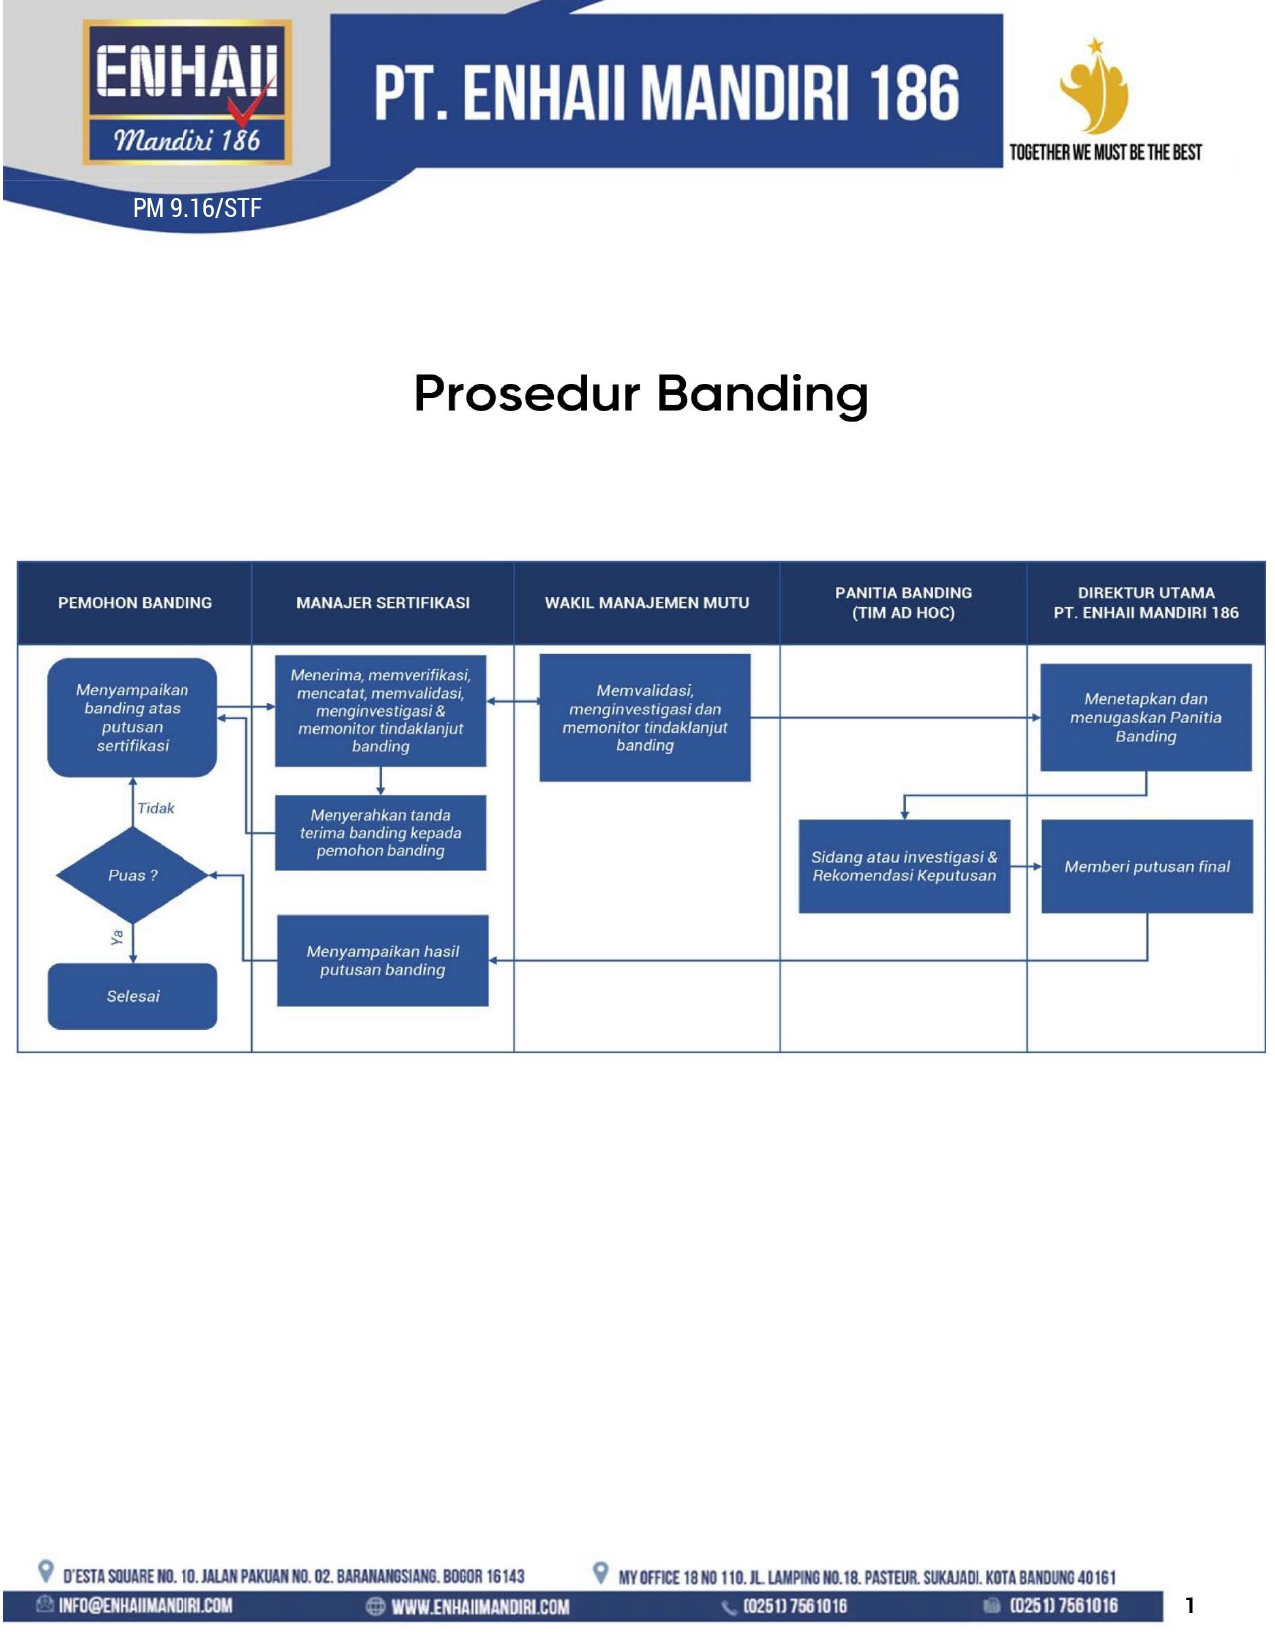 Prosedur Banding | Enhaii